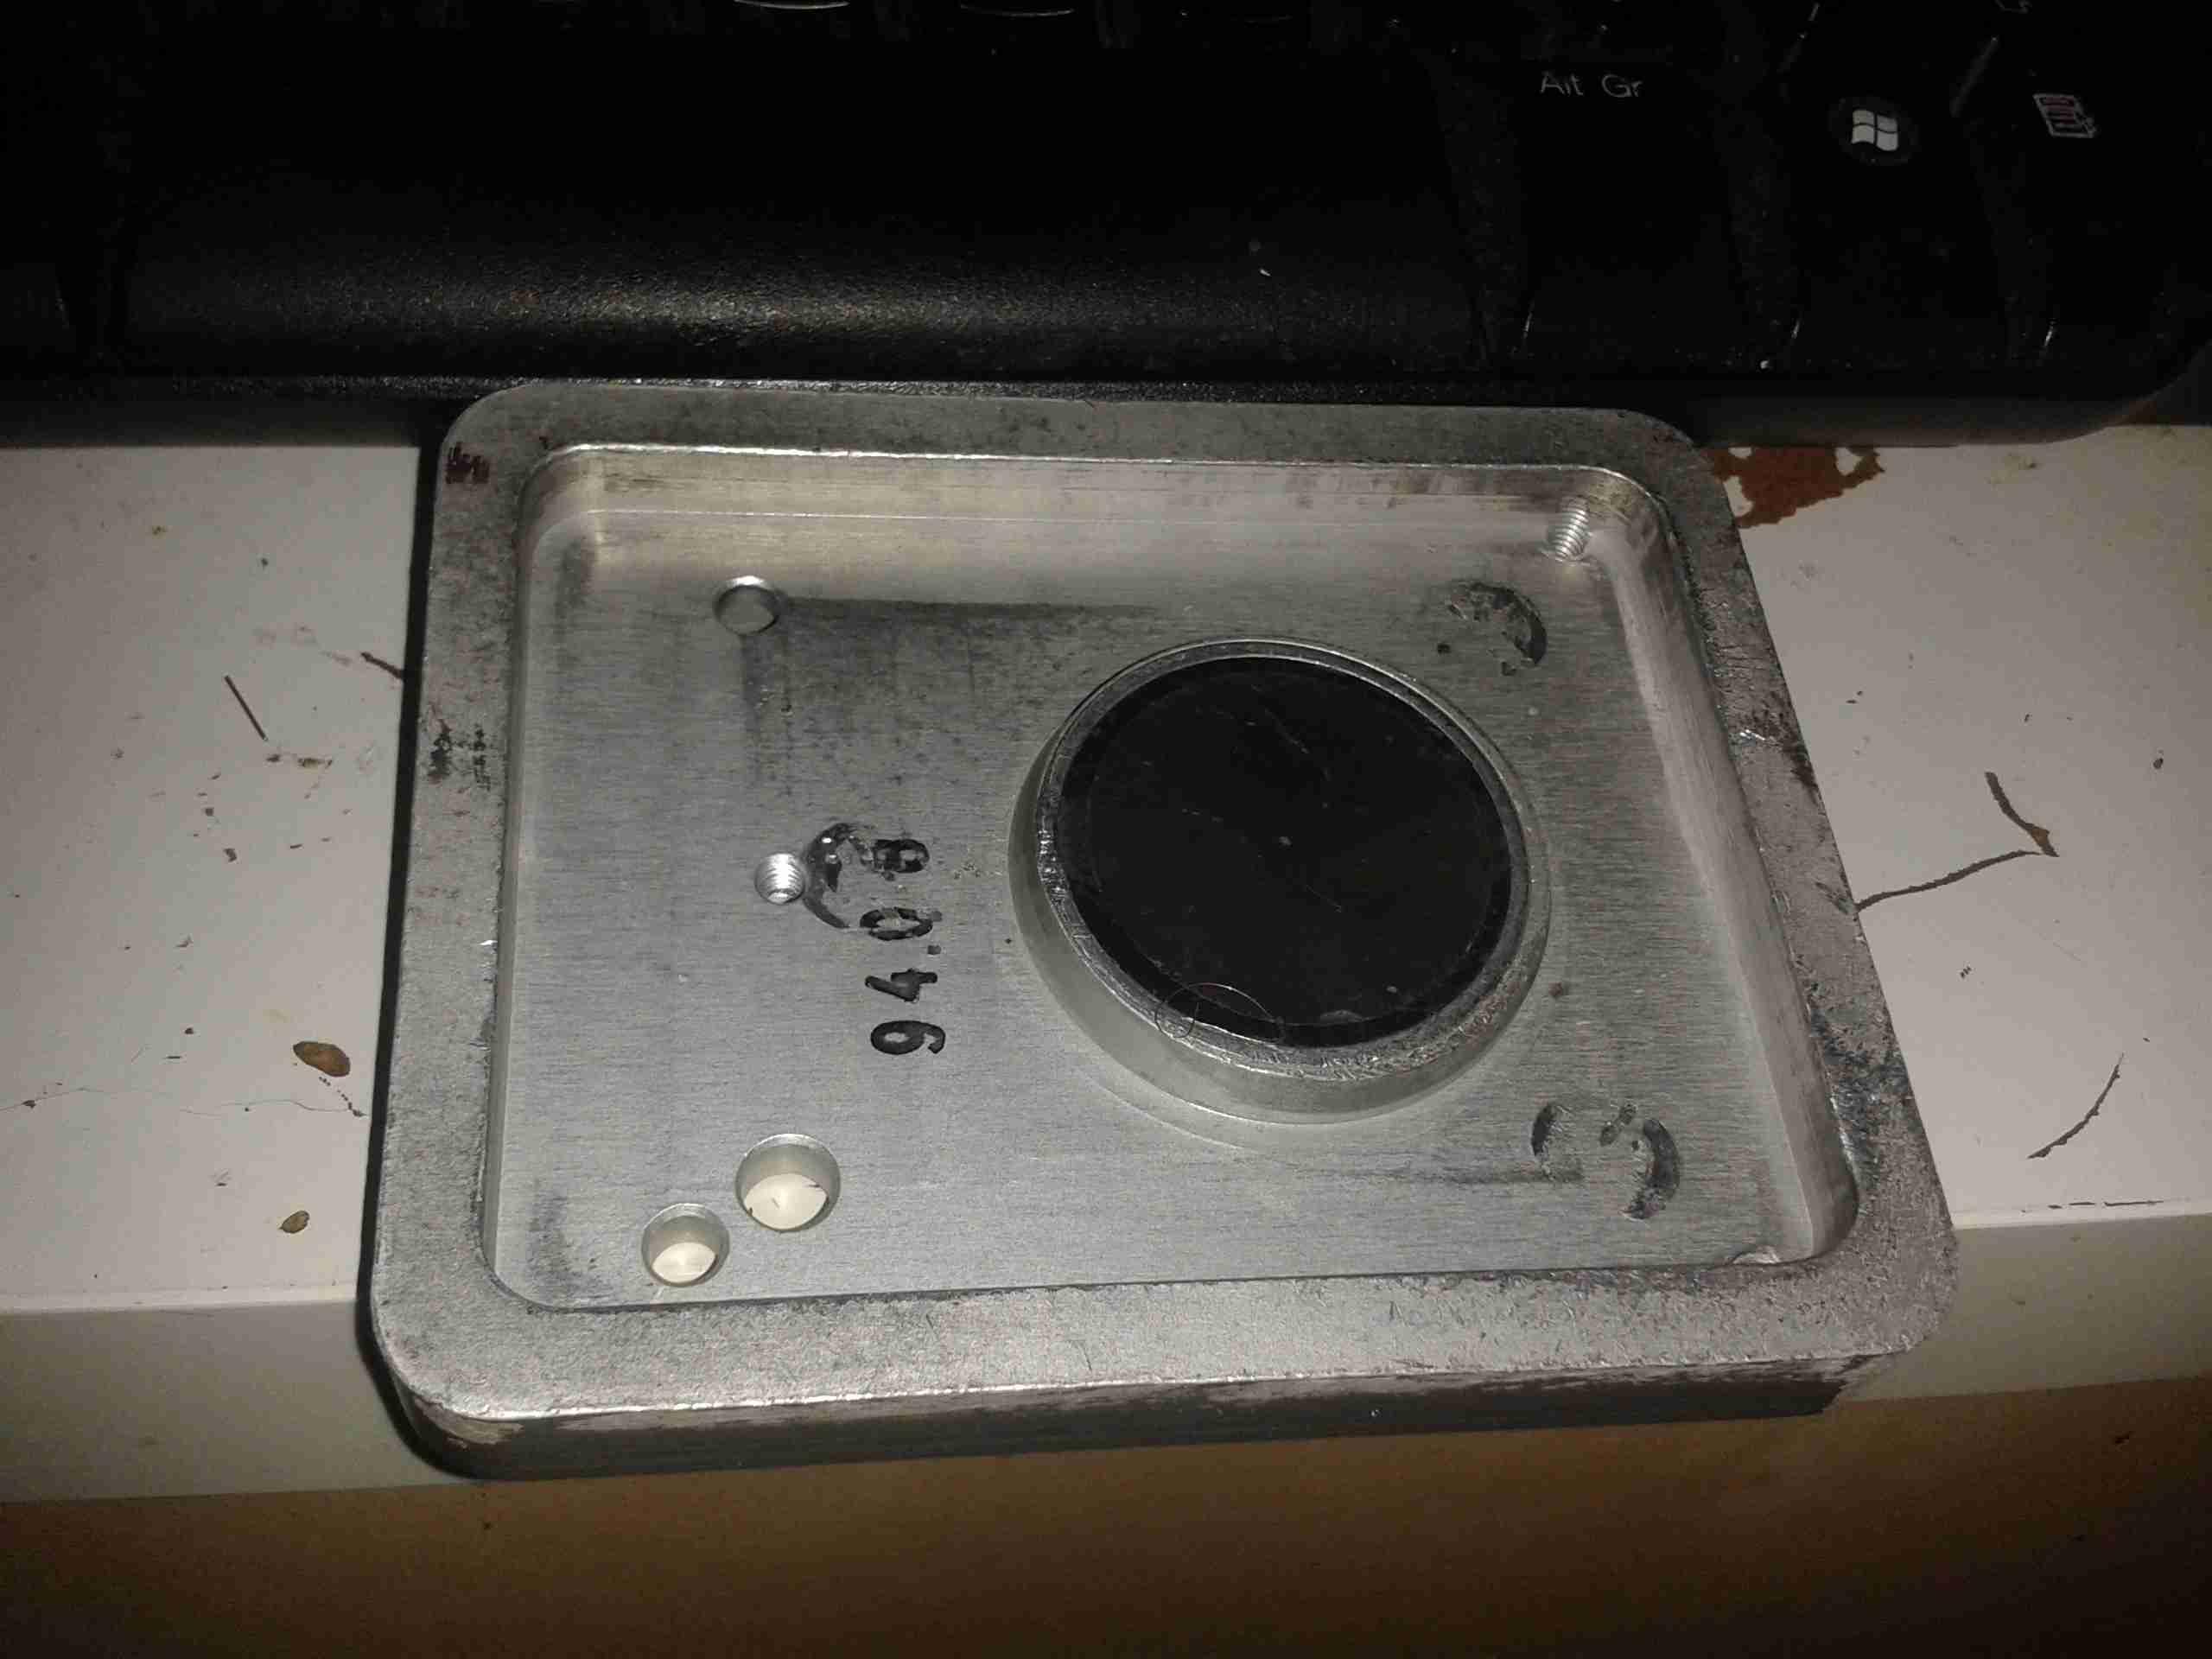 Aritech Vv602 Vault Vibration Sensor Experimental Engineering Seismic Mounting Plate